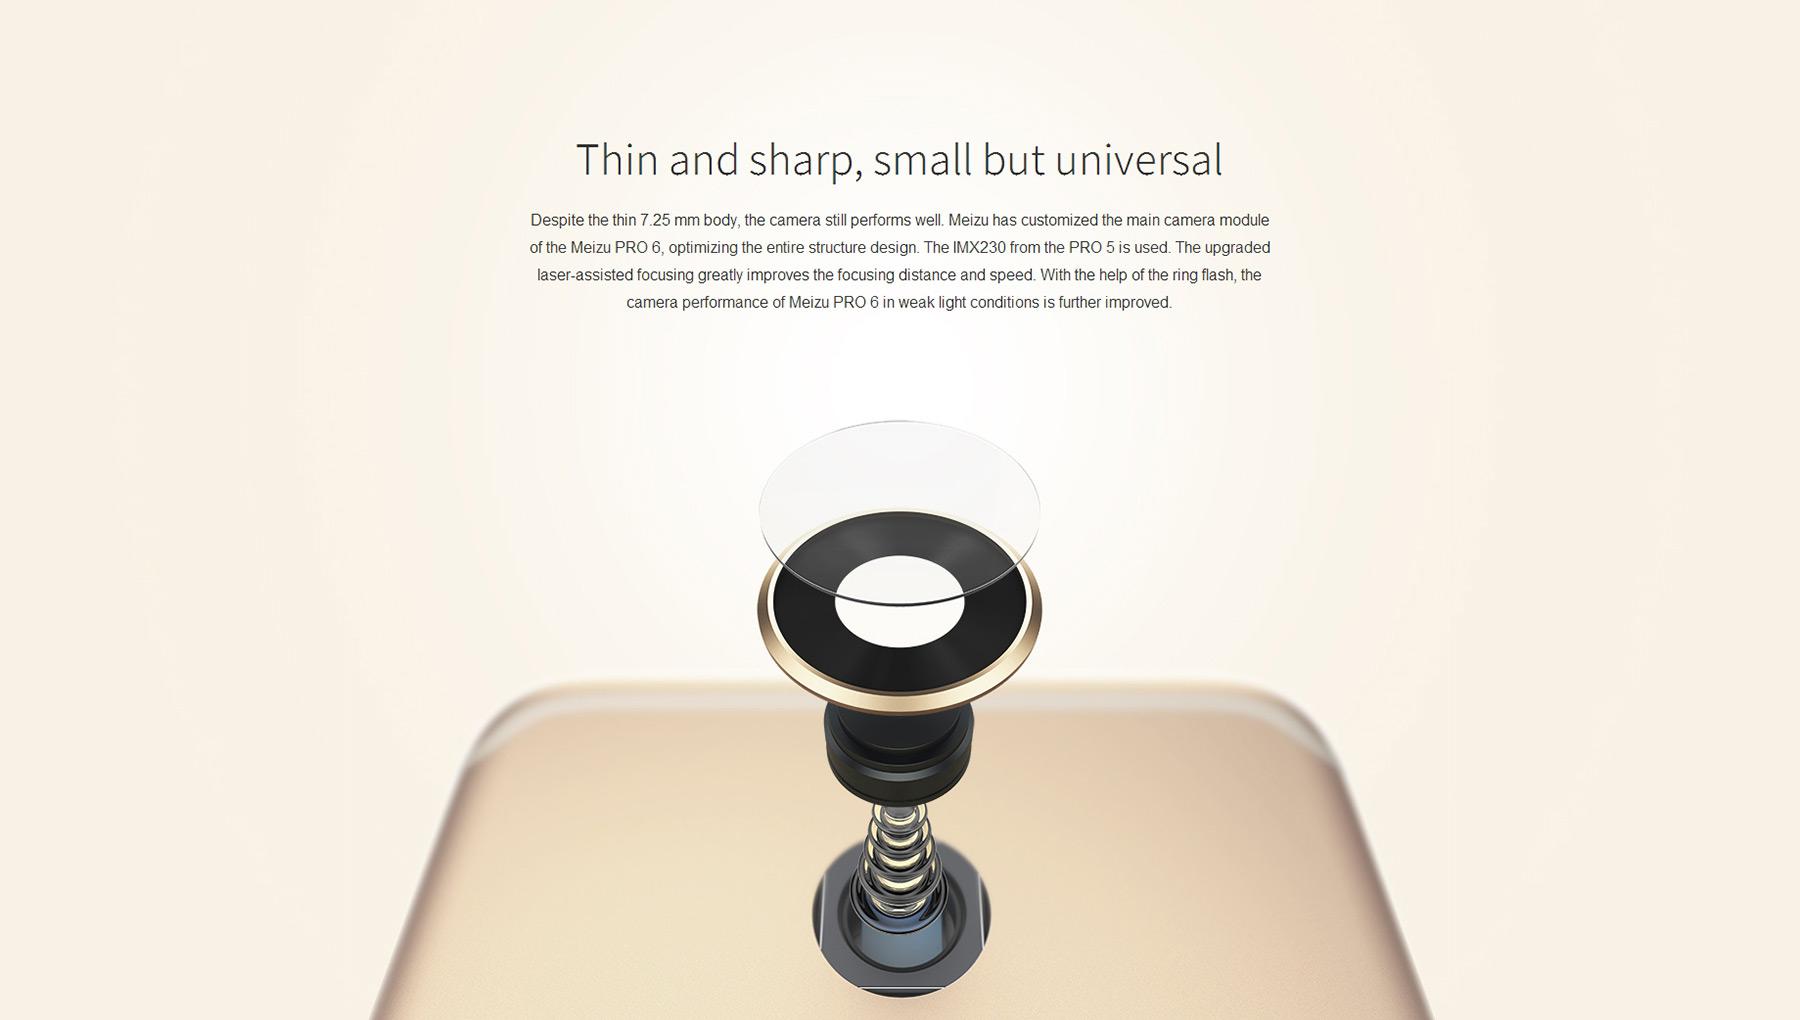 Meizu PRO 6, Antutu, Sony Kamera, China Smartphone, Neuheit, bester Preis, Gearbest, zoll PayPal, LTE 800, OIS Bildstabilisator digital